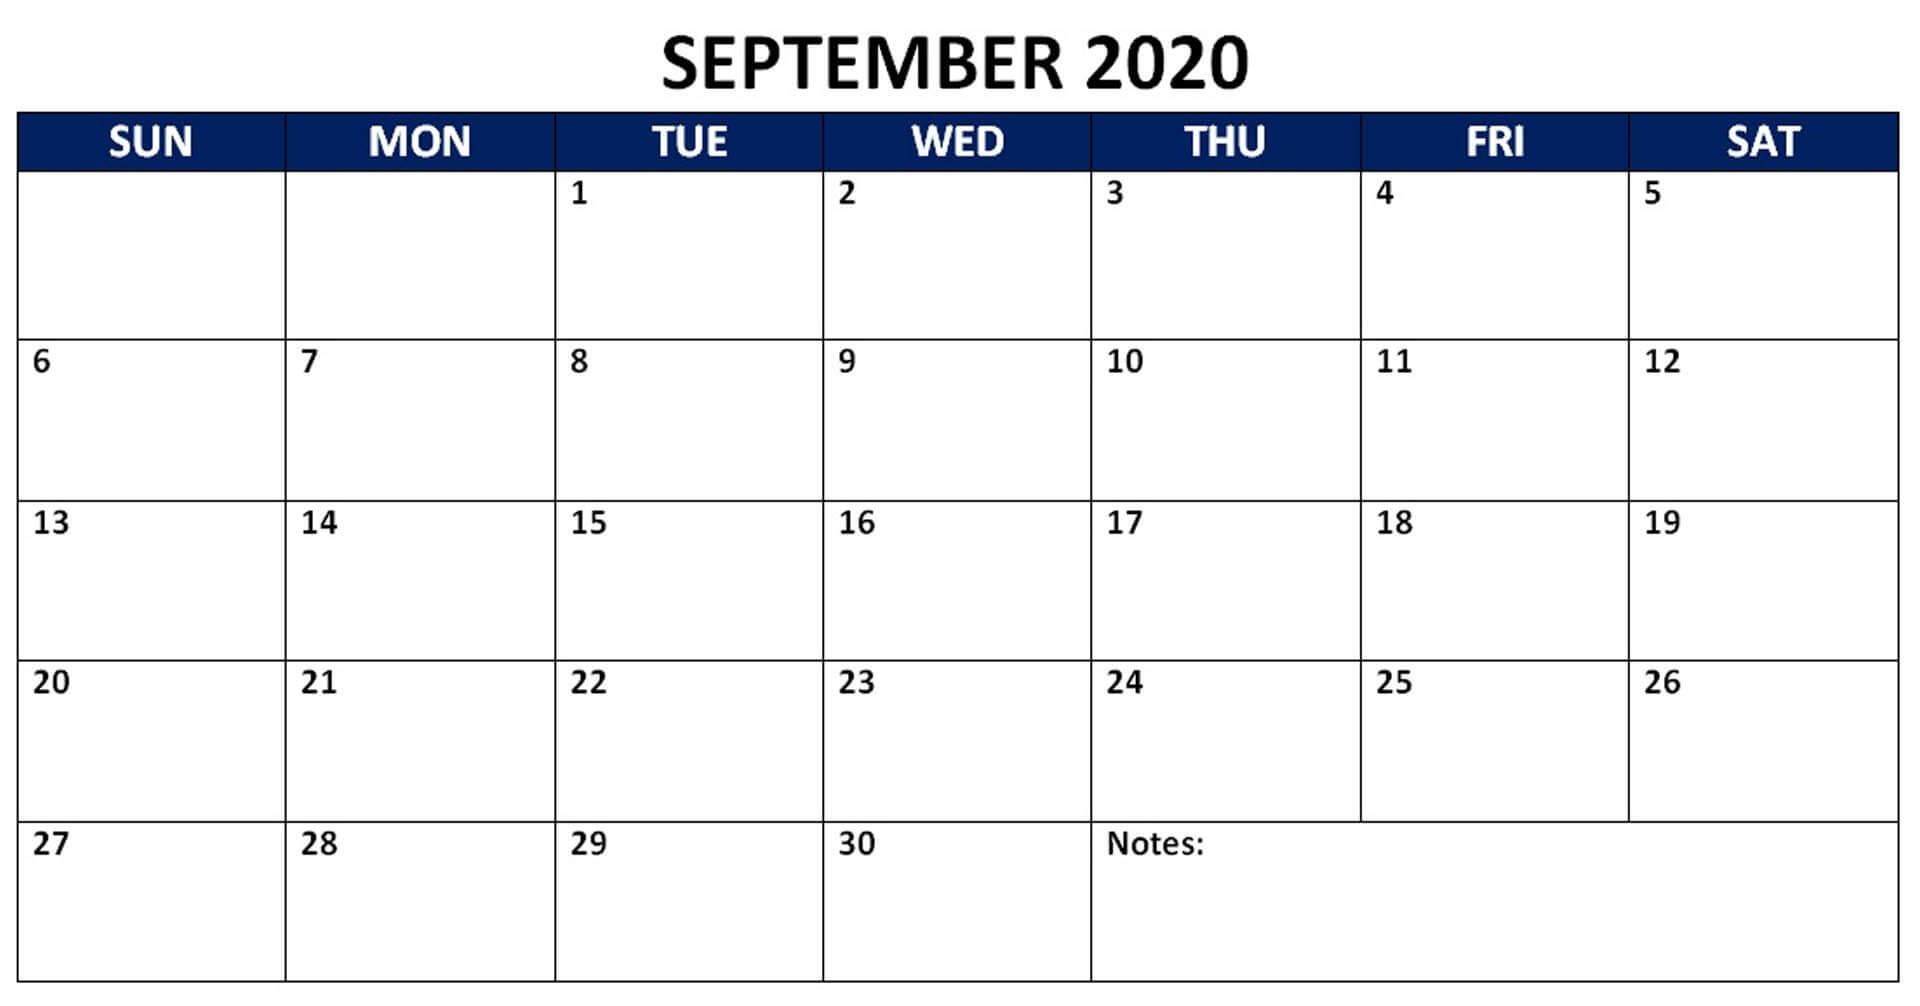 Blank September 2020 Editable Calendar